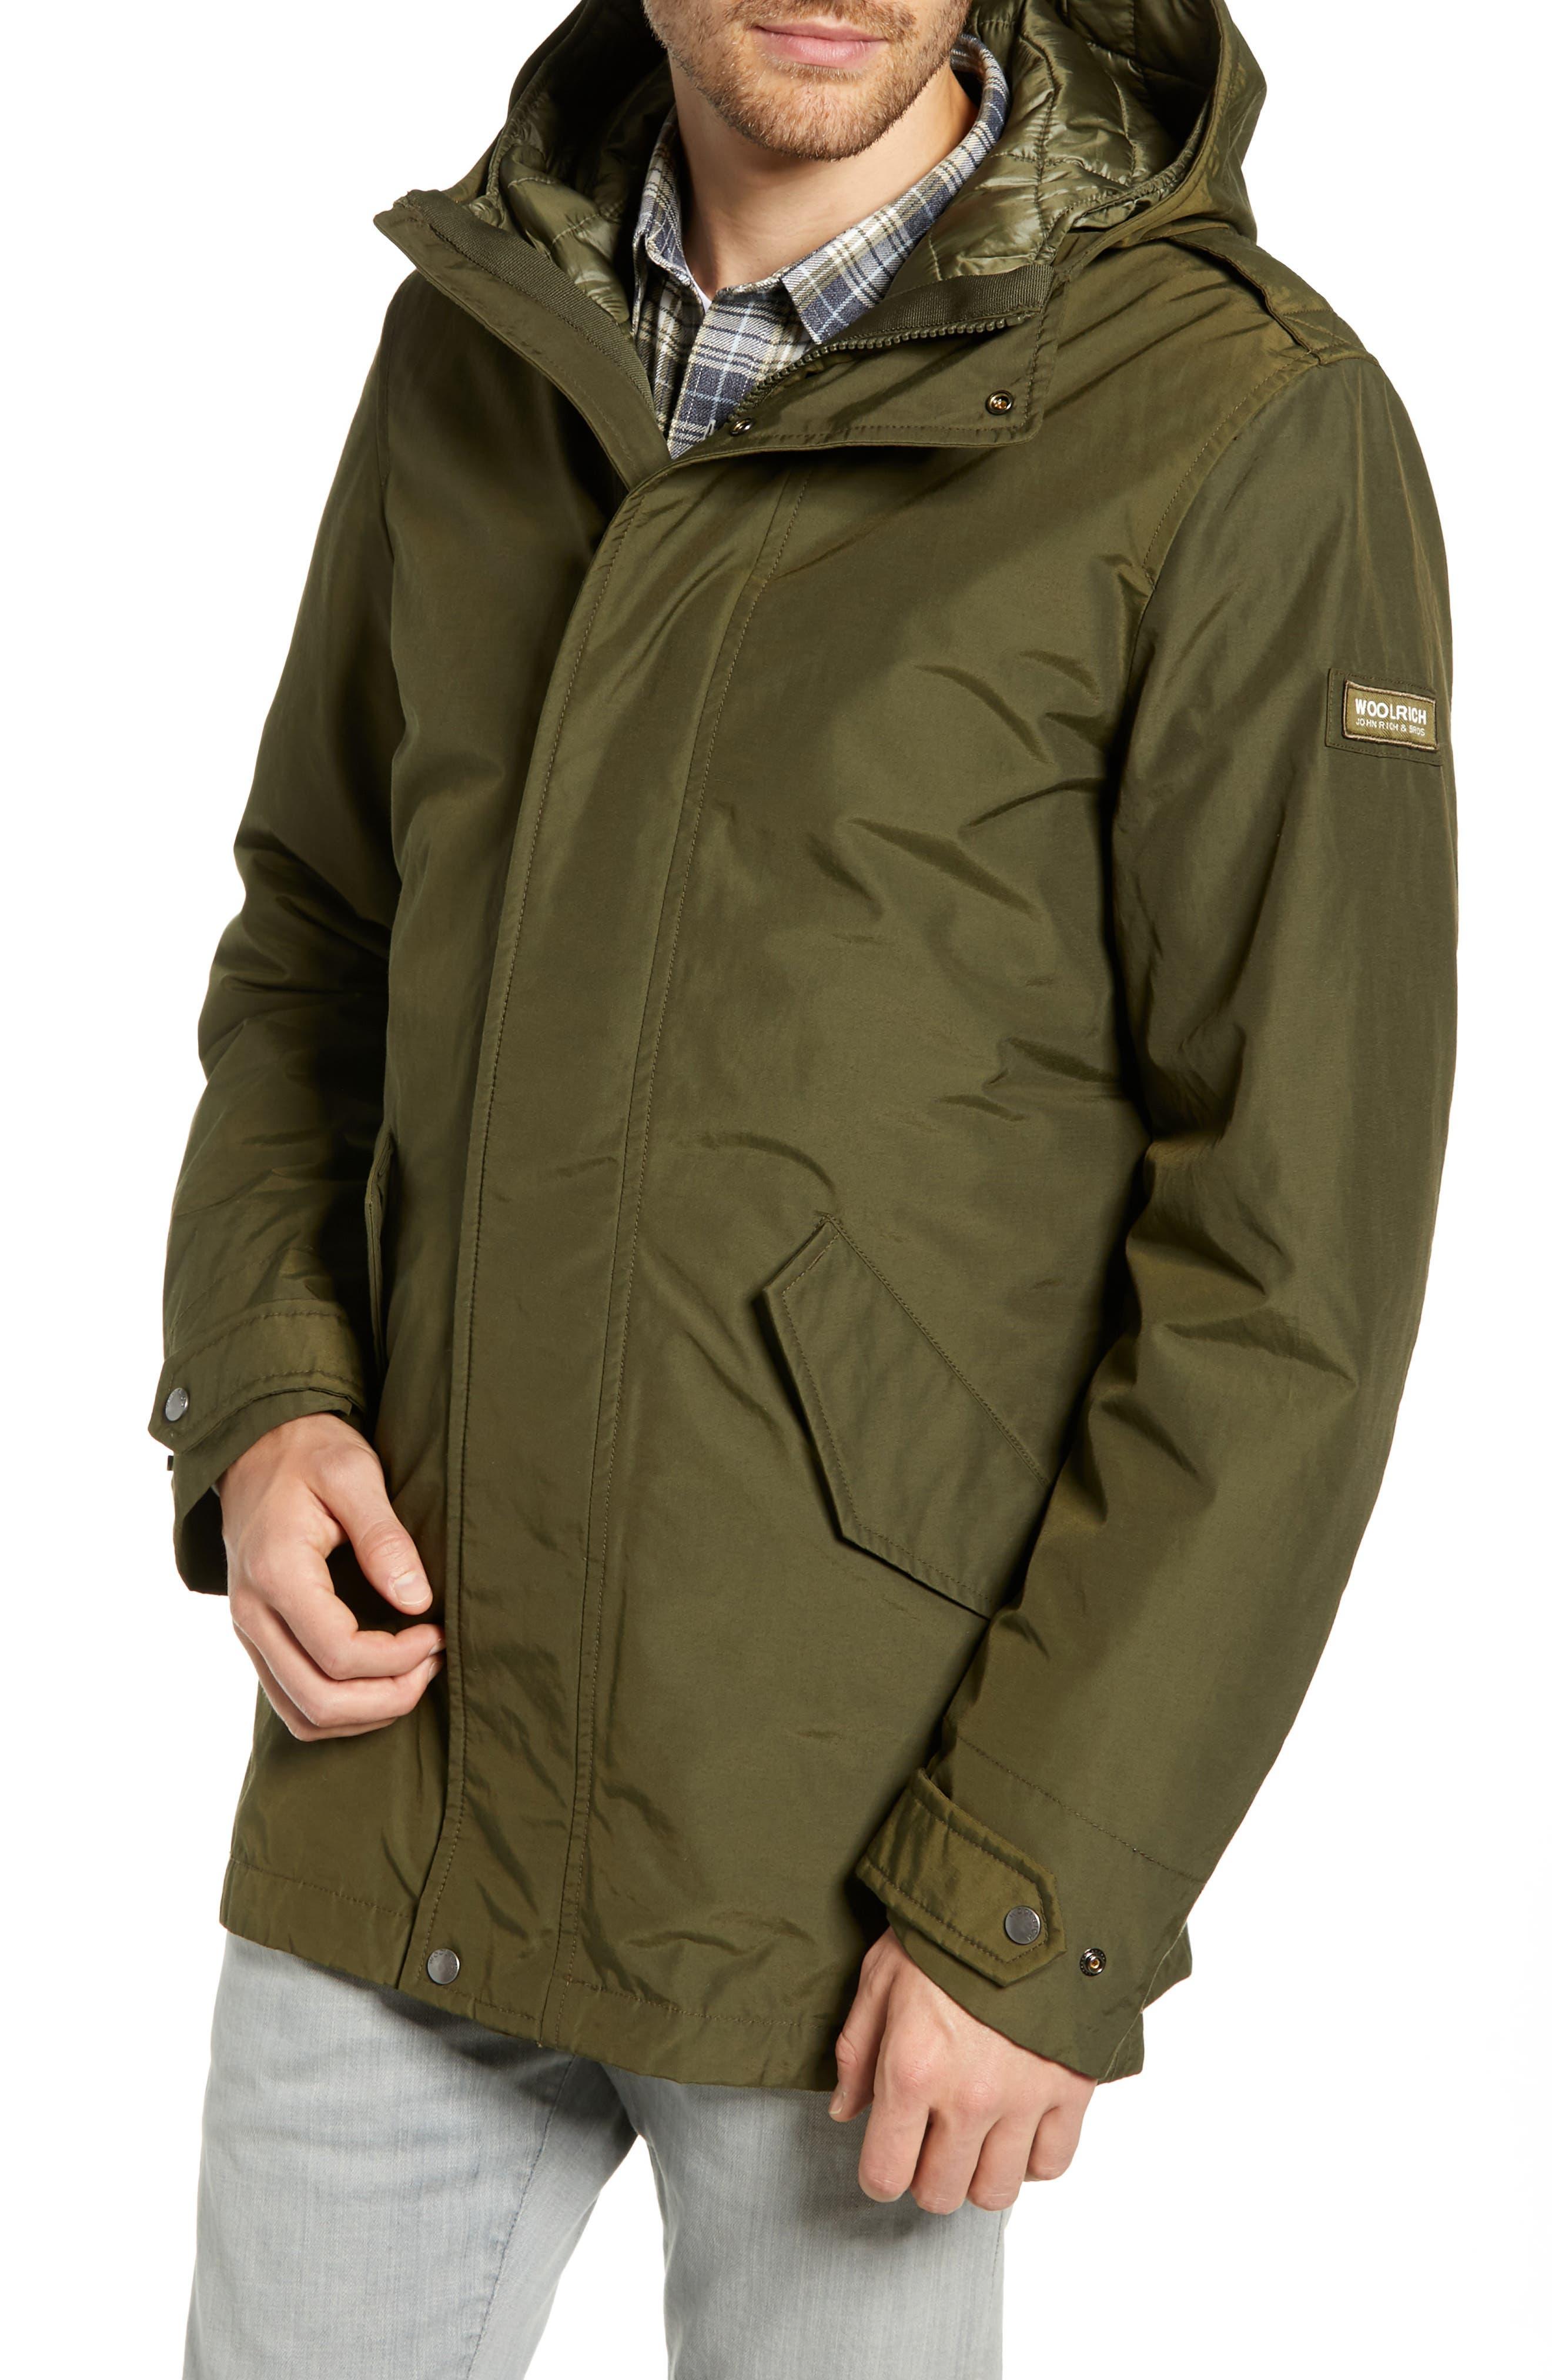 John Rich 'Long Military Eskimo' 3-in-1 Hooded Jacket,                             Alternate thumbnail 5, color,                             FLINT OLIVE